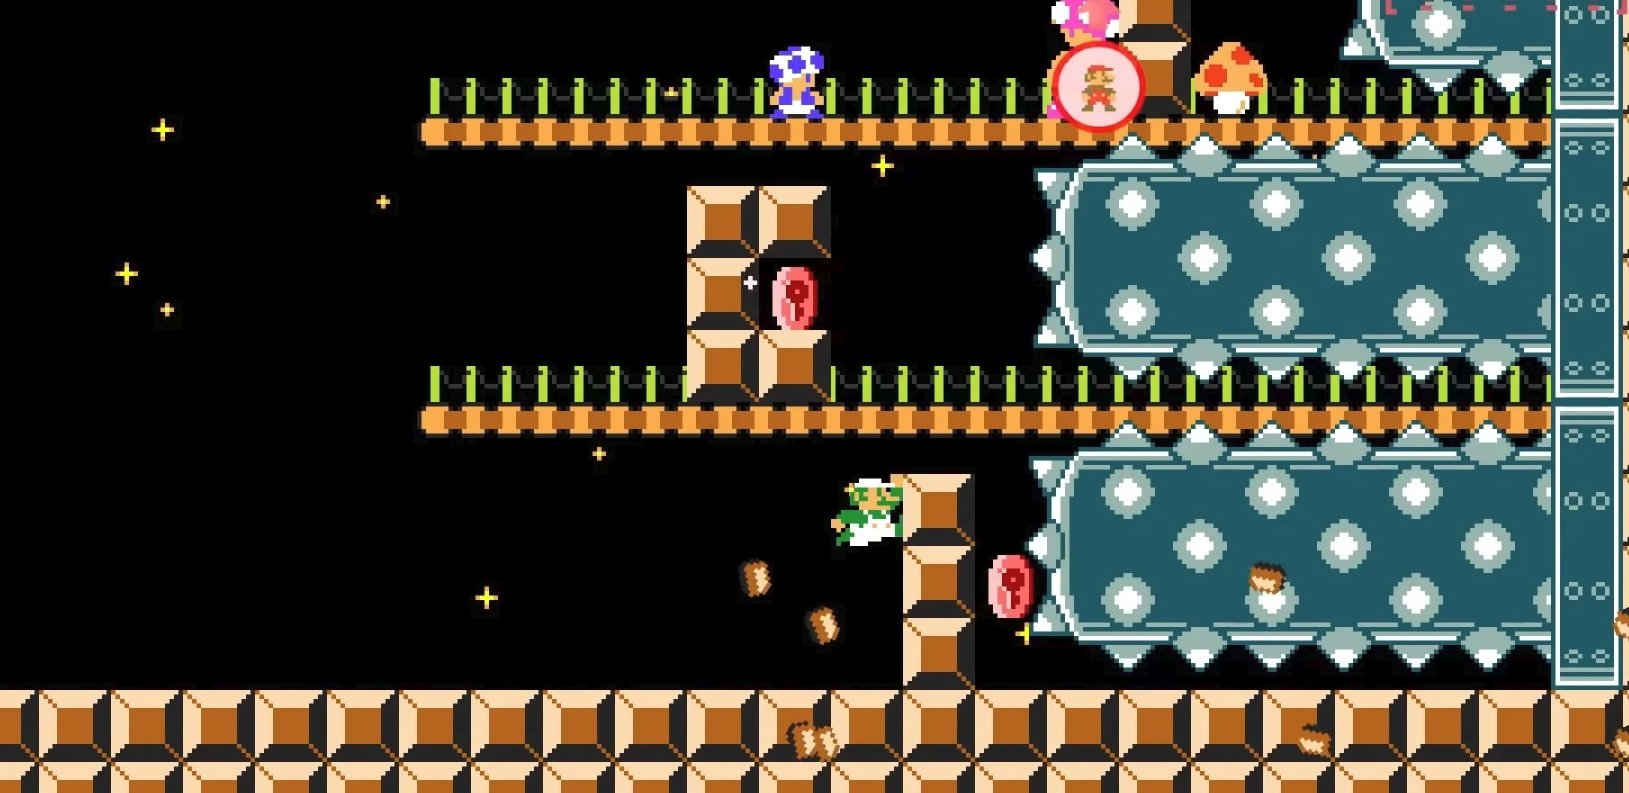 Nintendo Download: Super Mario Maker 2 screenshot